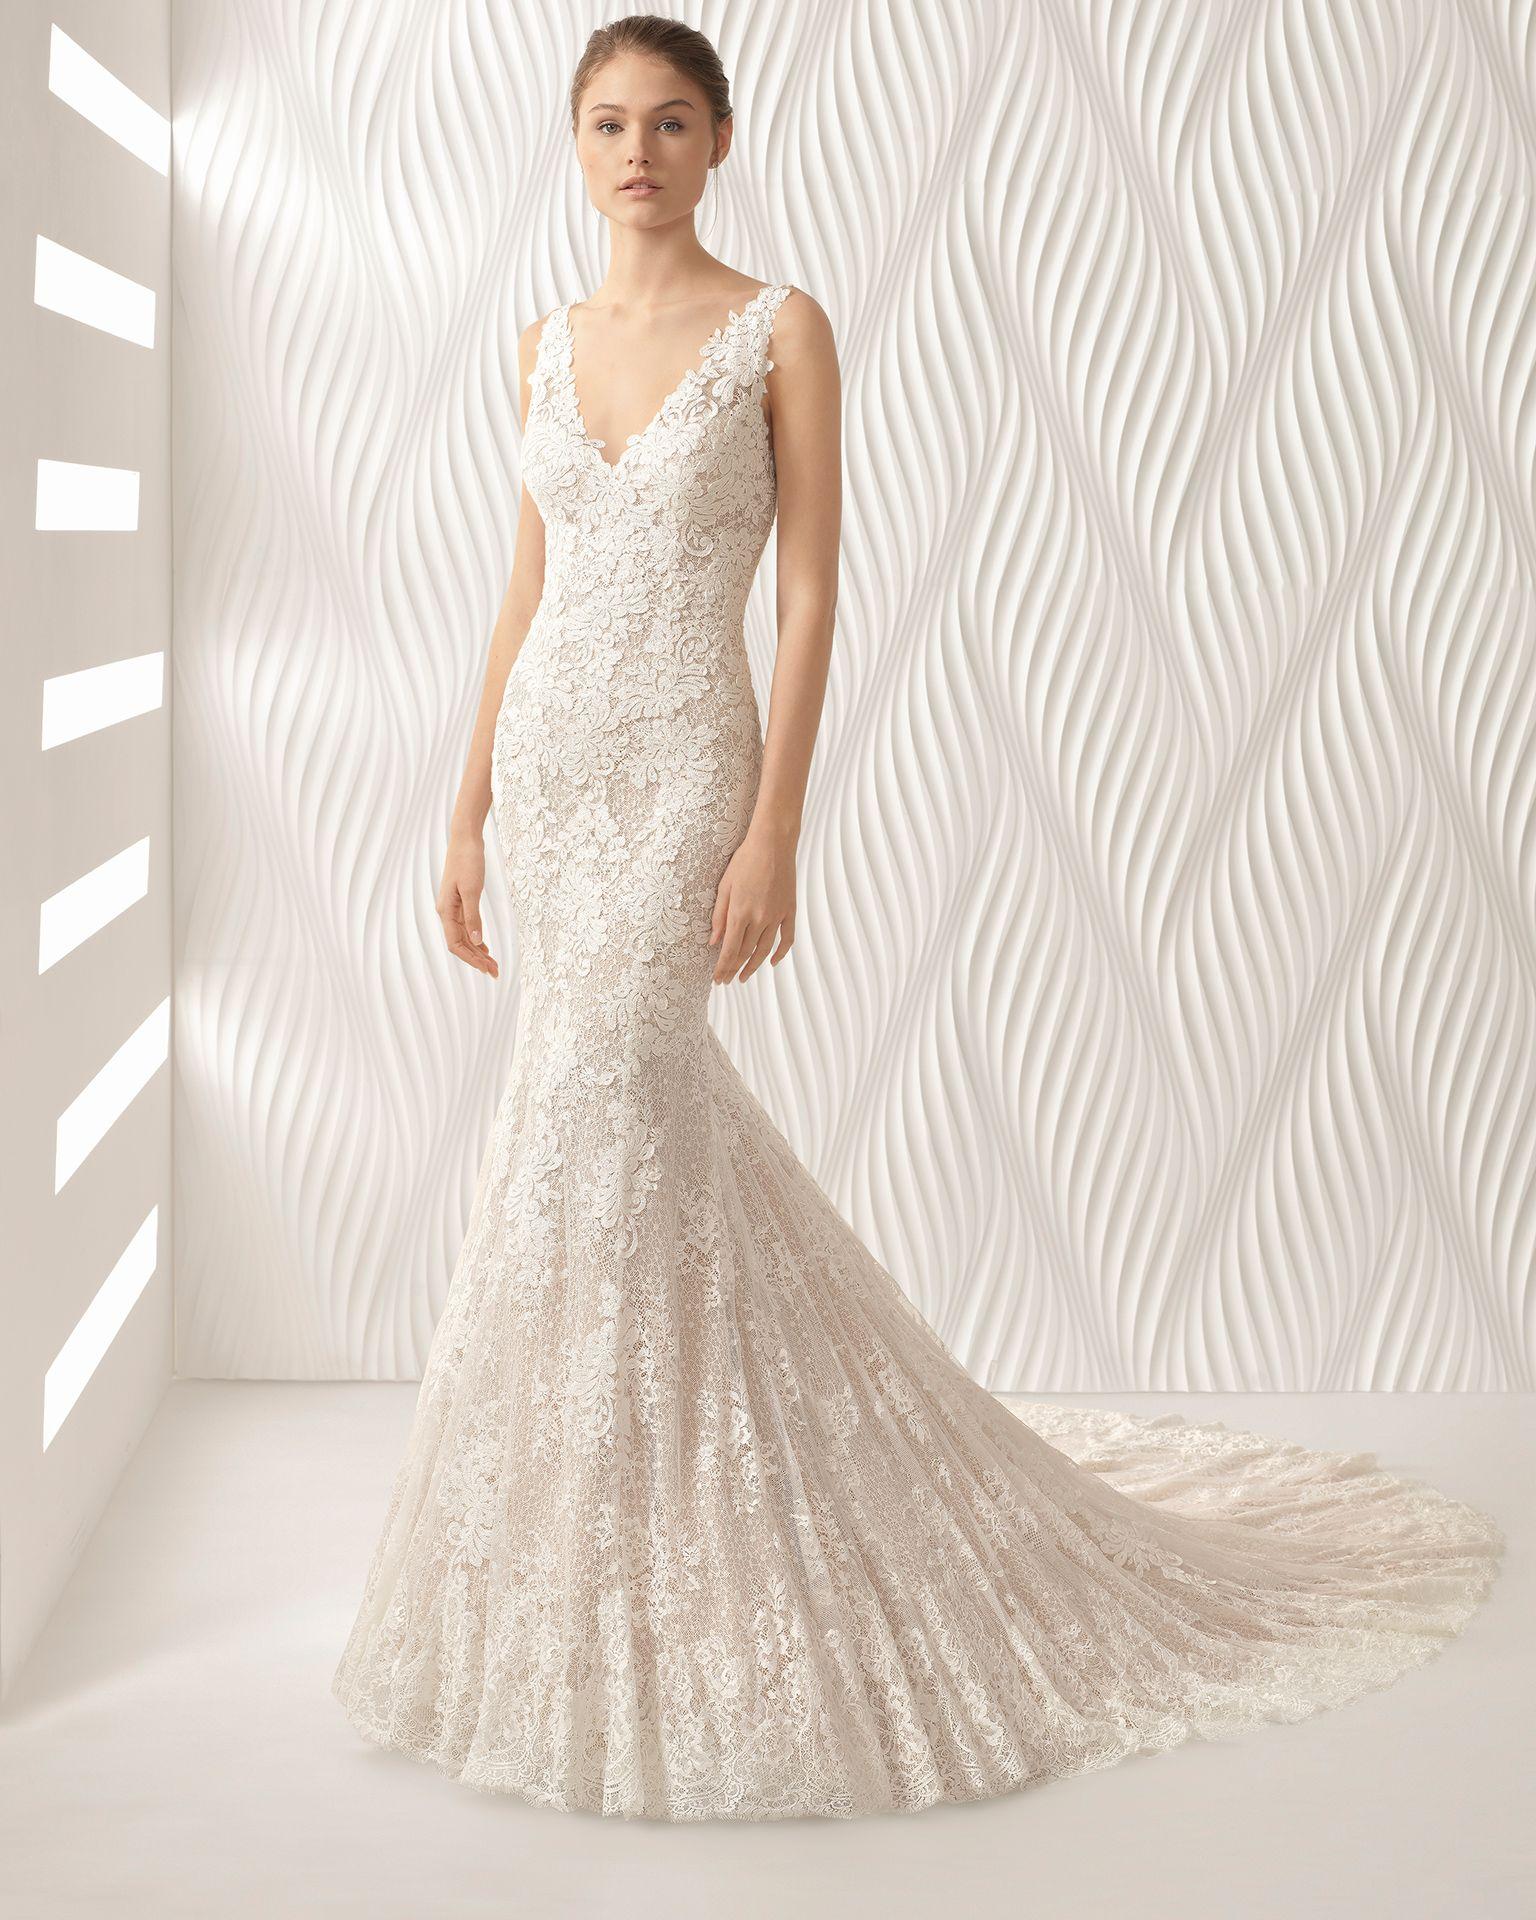 d71fd680c559 ADELA - Mermaid-style lace wedding dress with V-neckline. 2018 Rosa Clará